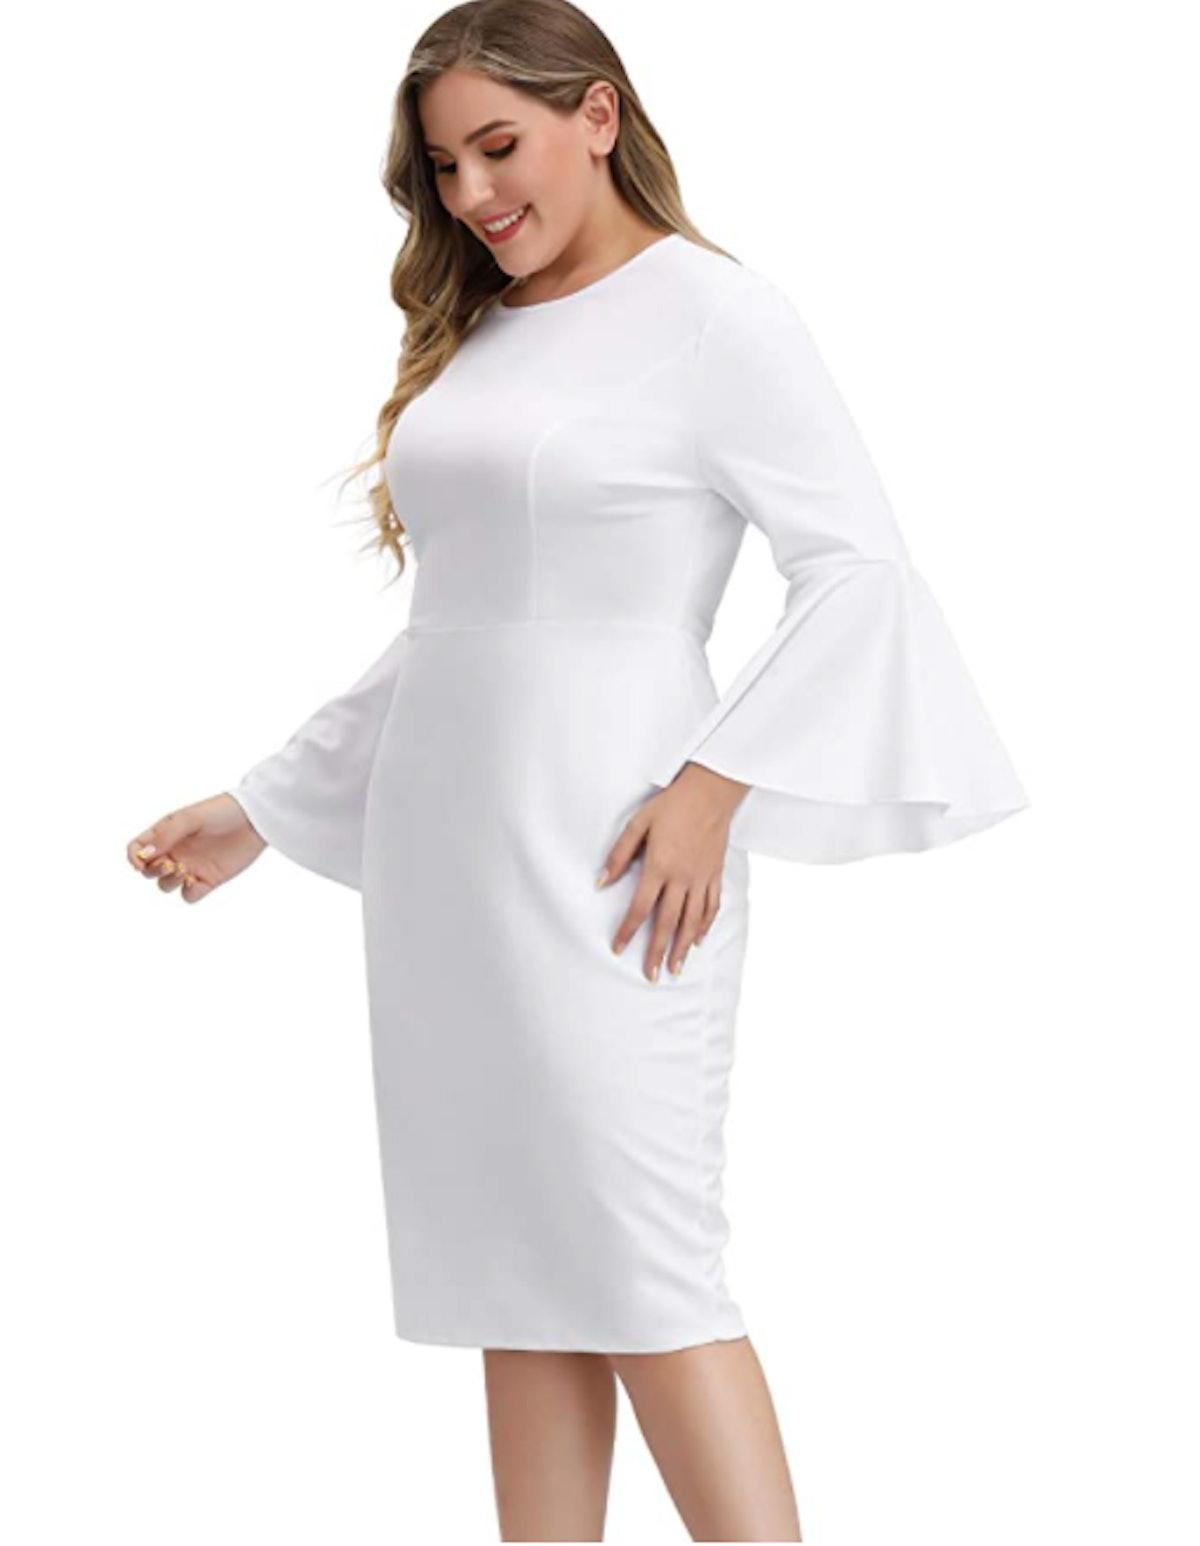 Hanna Nikole Plus-Size Bell Sleeve Pencil Dress